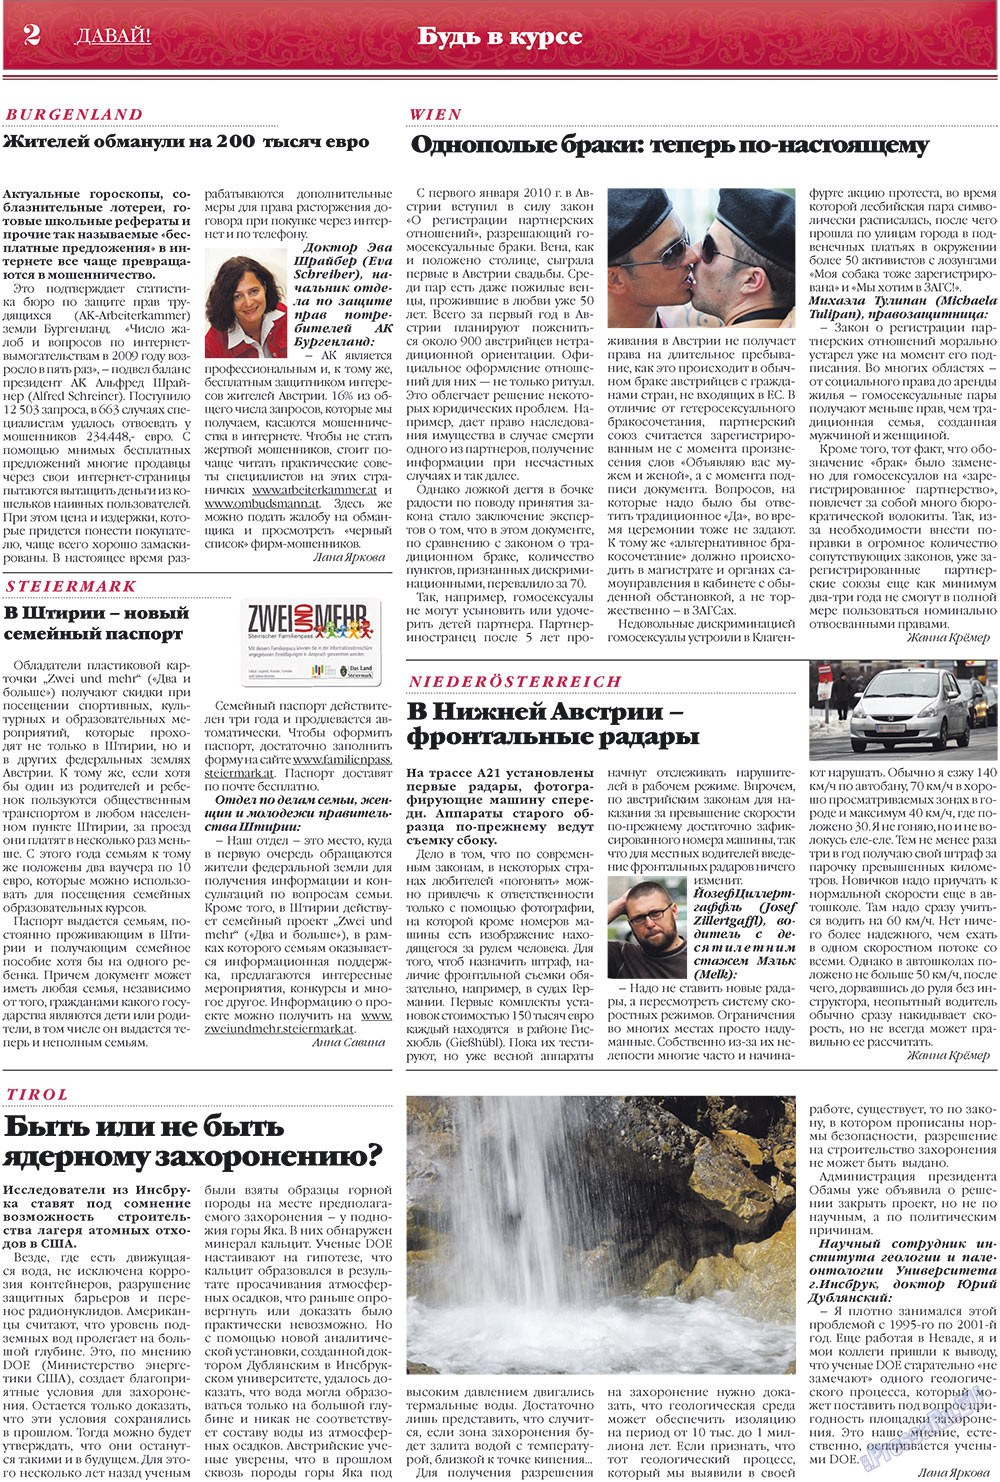 Давай (газета). 2010 год, номер 1, стр. 2